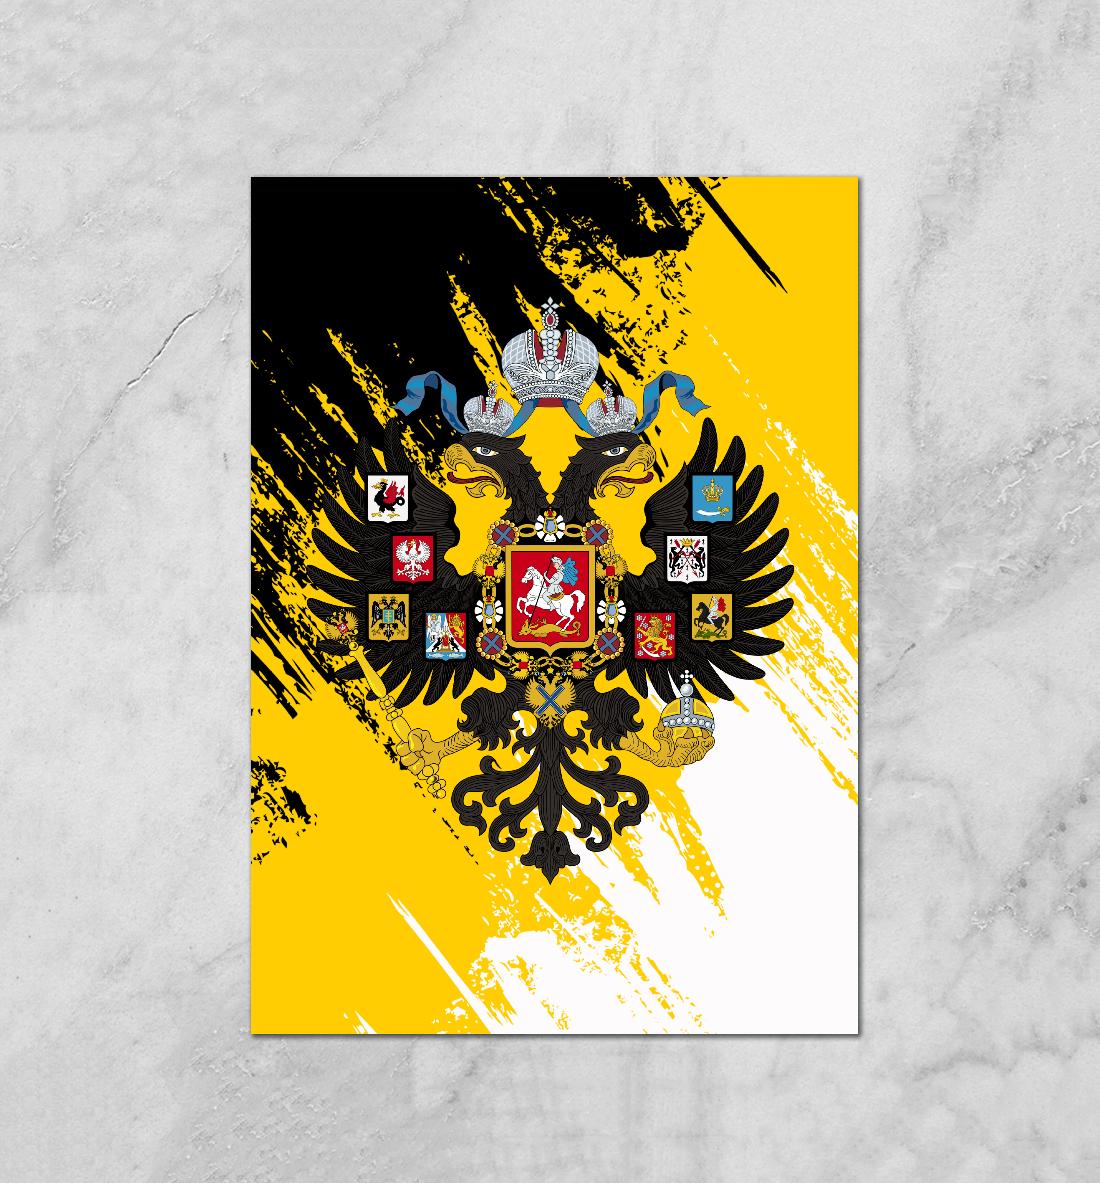 российский имперский флаг картинки кабина